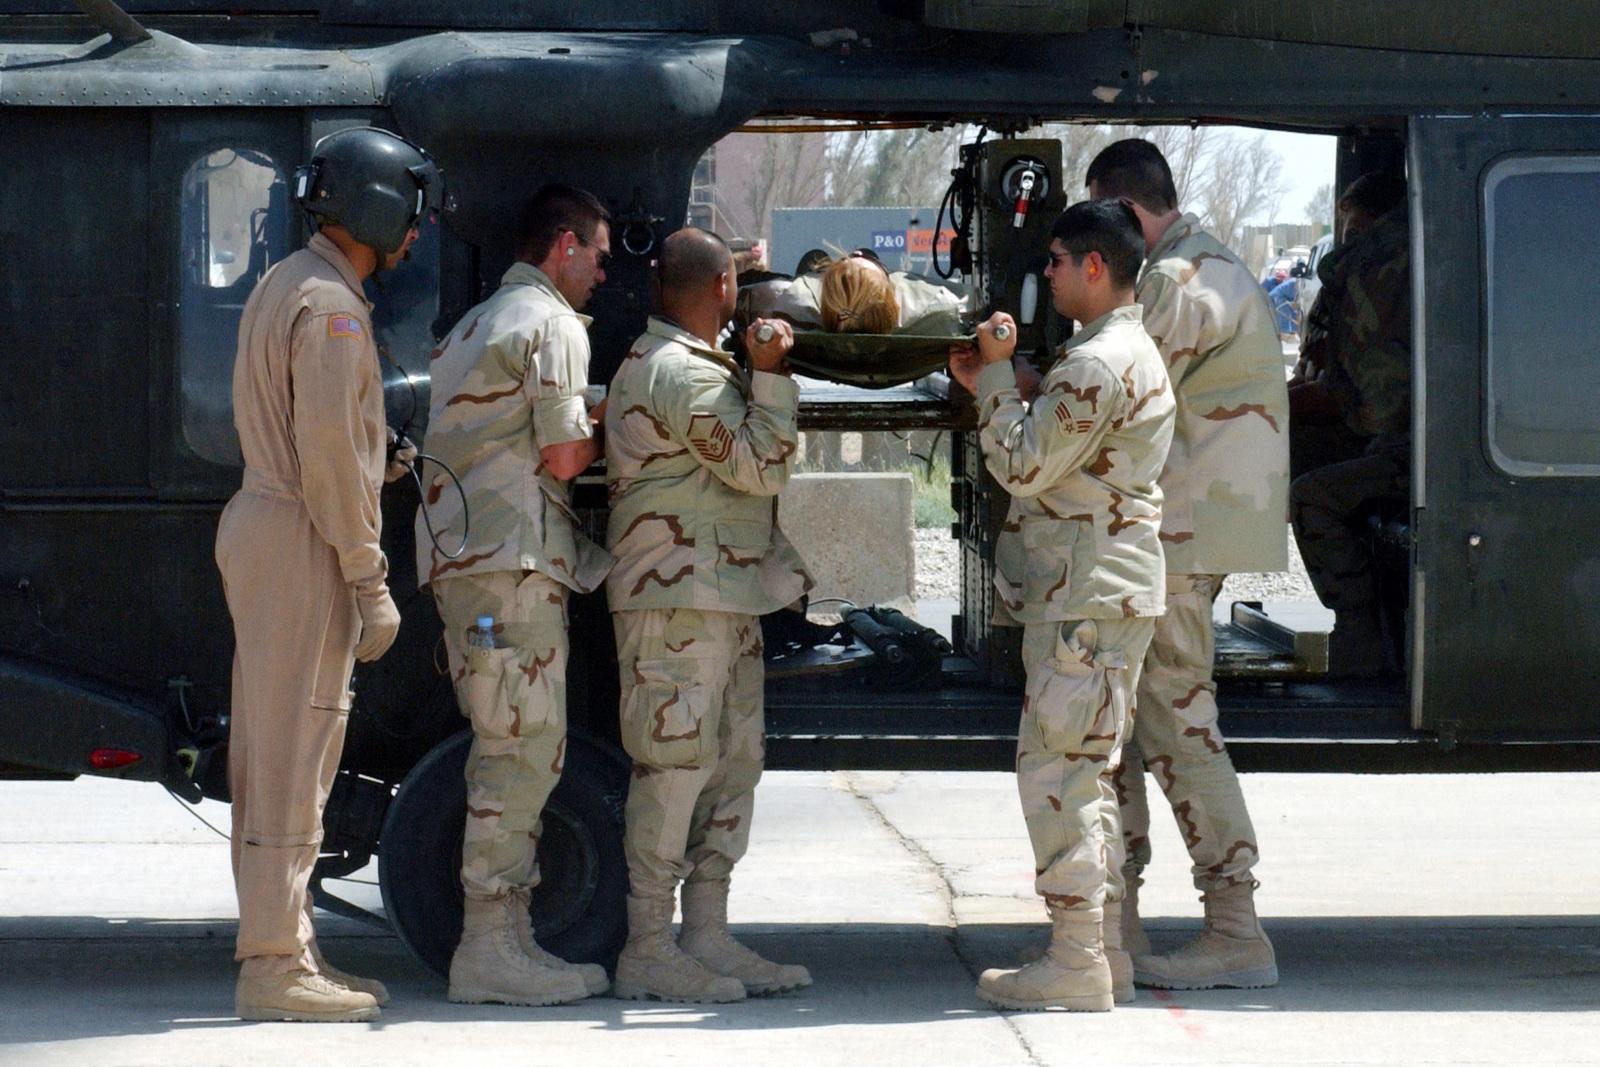 b4575995d122 Us army usa sergeant first class juan dometriz in flight jpg 1600x1067  Black helicopter flight suit